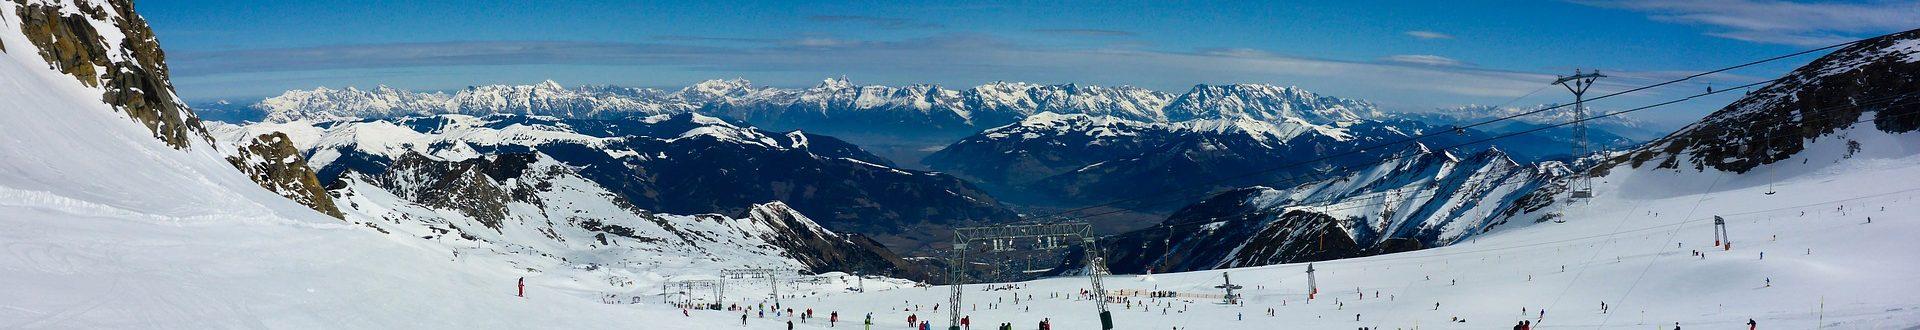 Ski groepsreizen met Veenstra Reizen